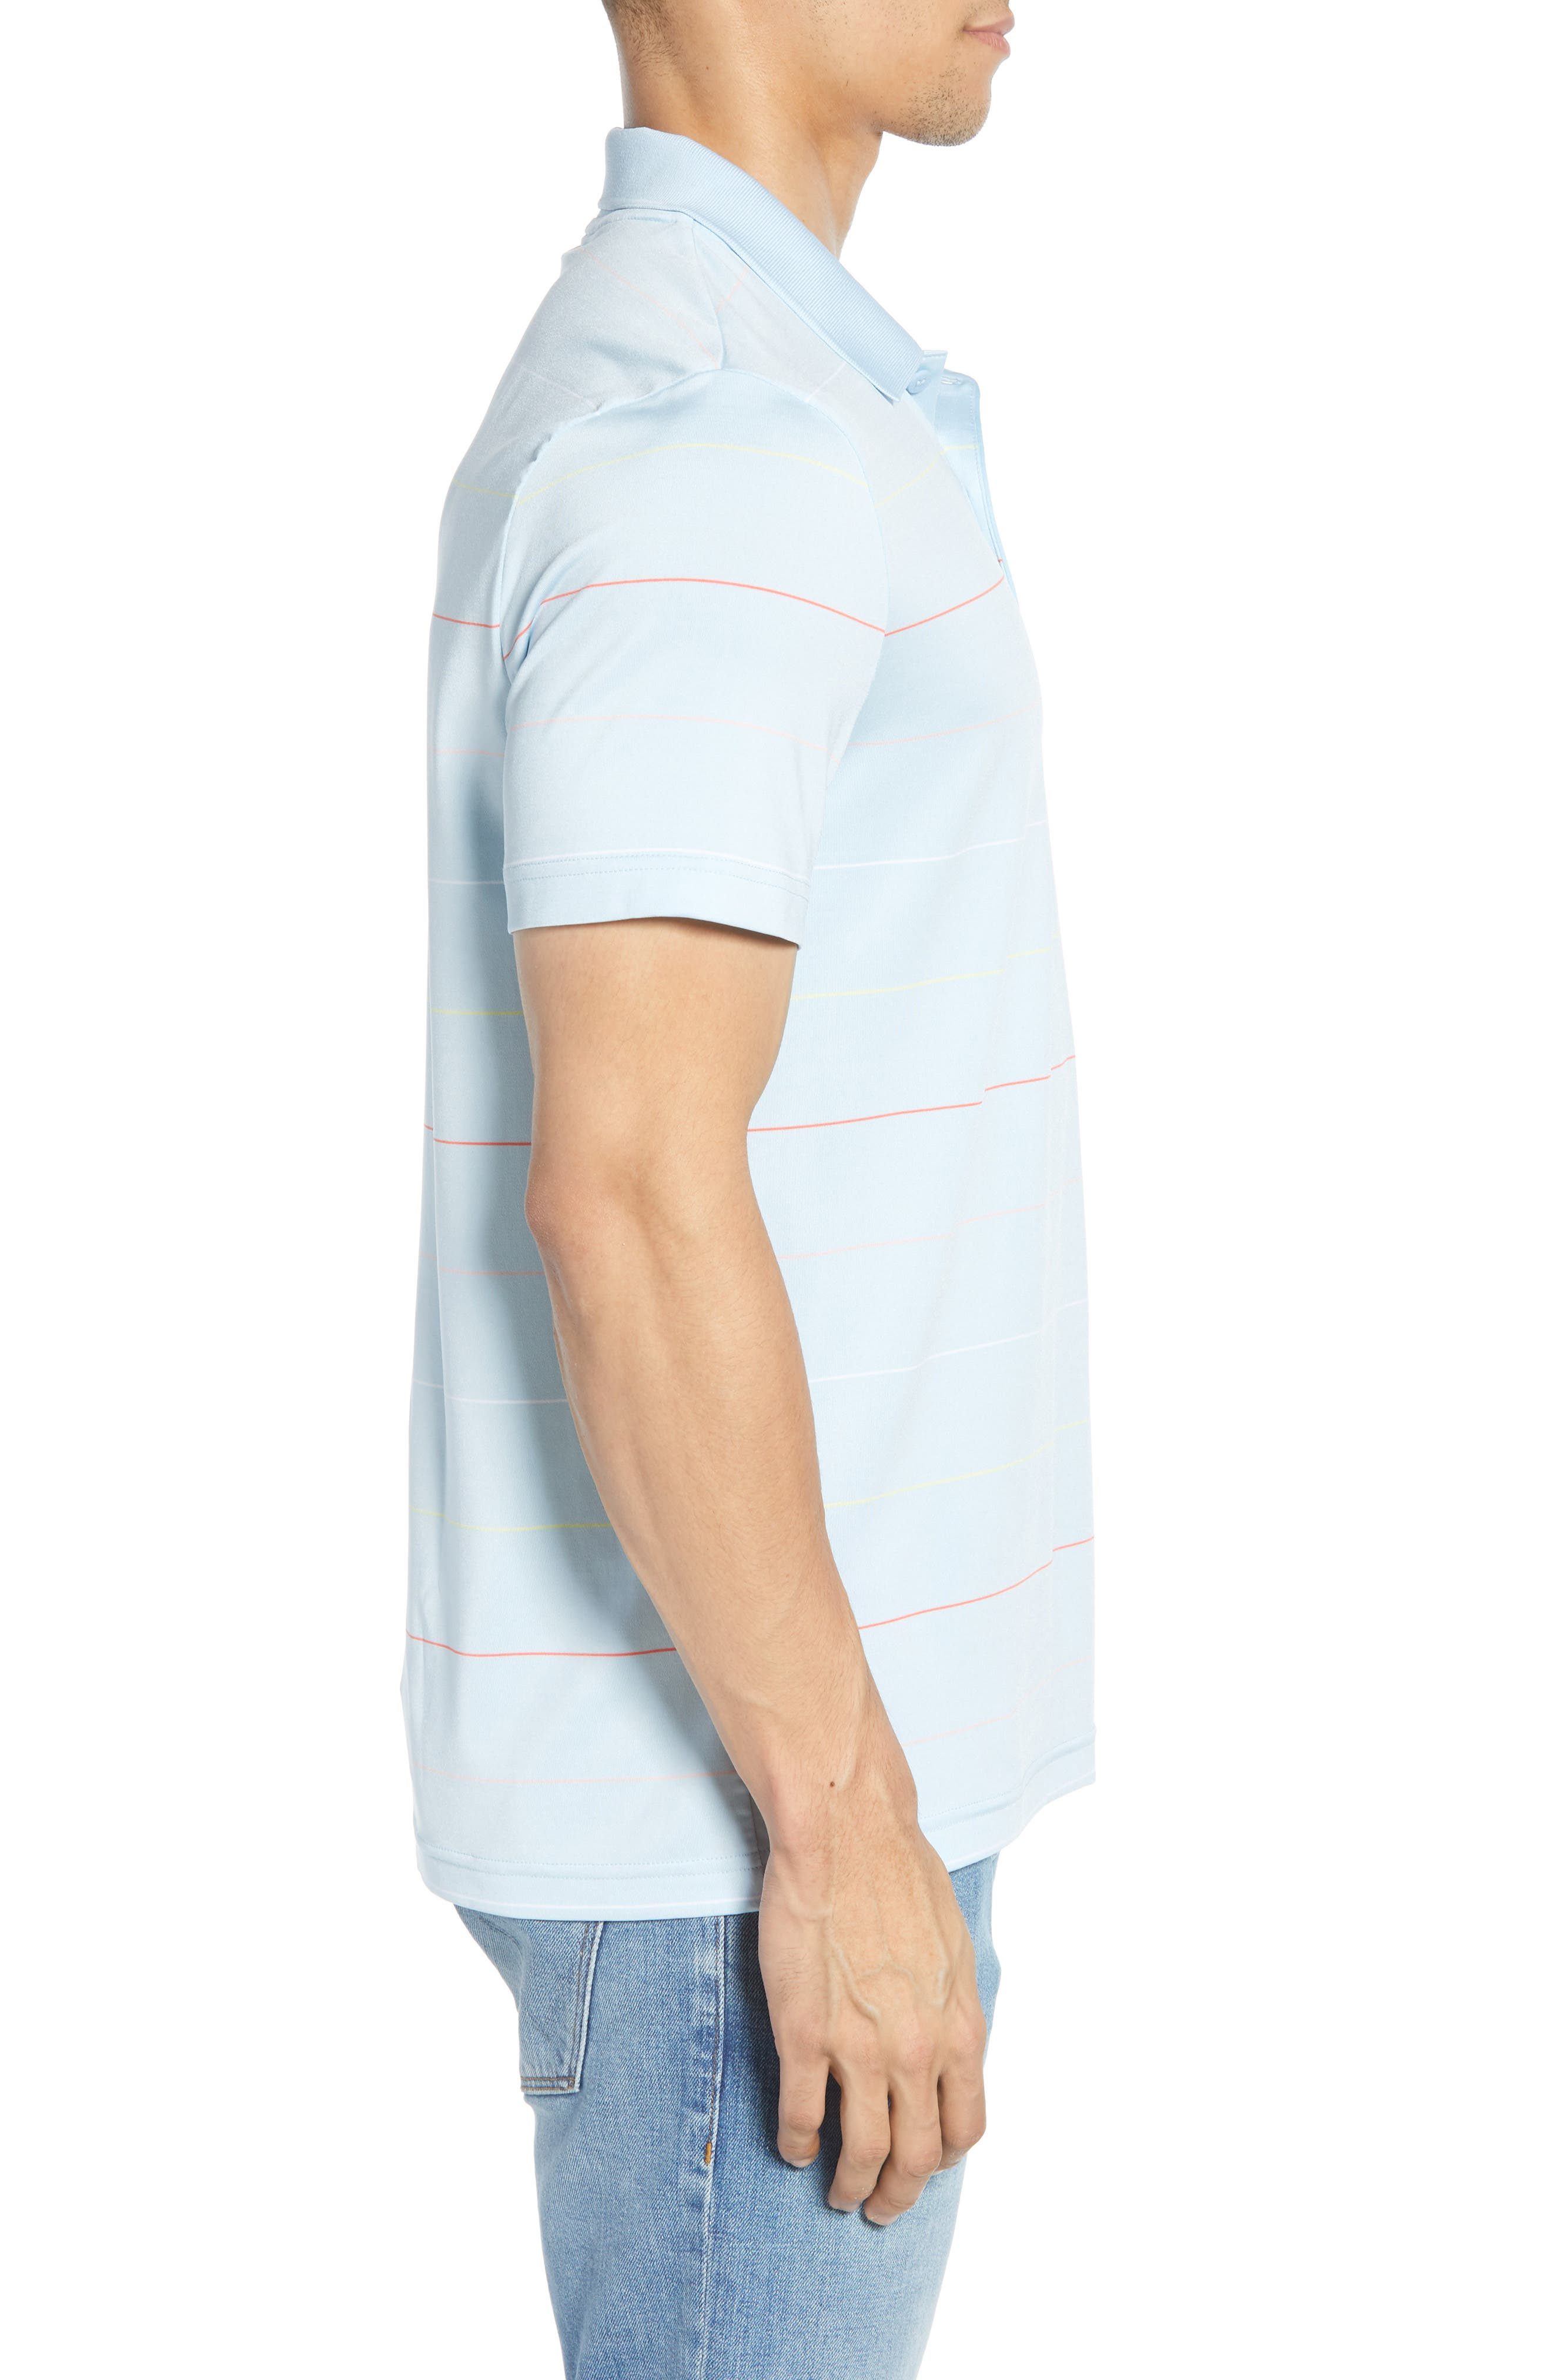 LACOSTE, Ultra Dry Regular Fit Tech Polo, Alternate thumbnail 3, color, DREAM BLUE/ MANGO